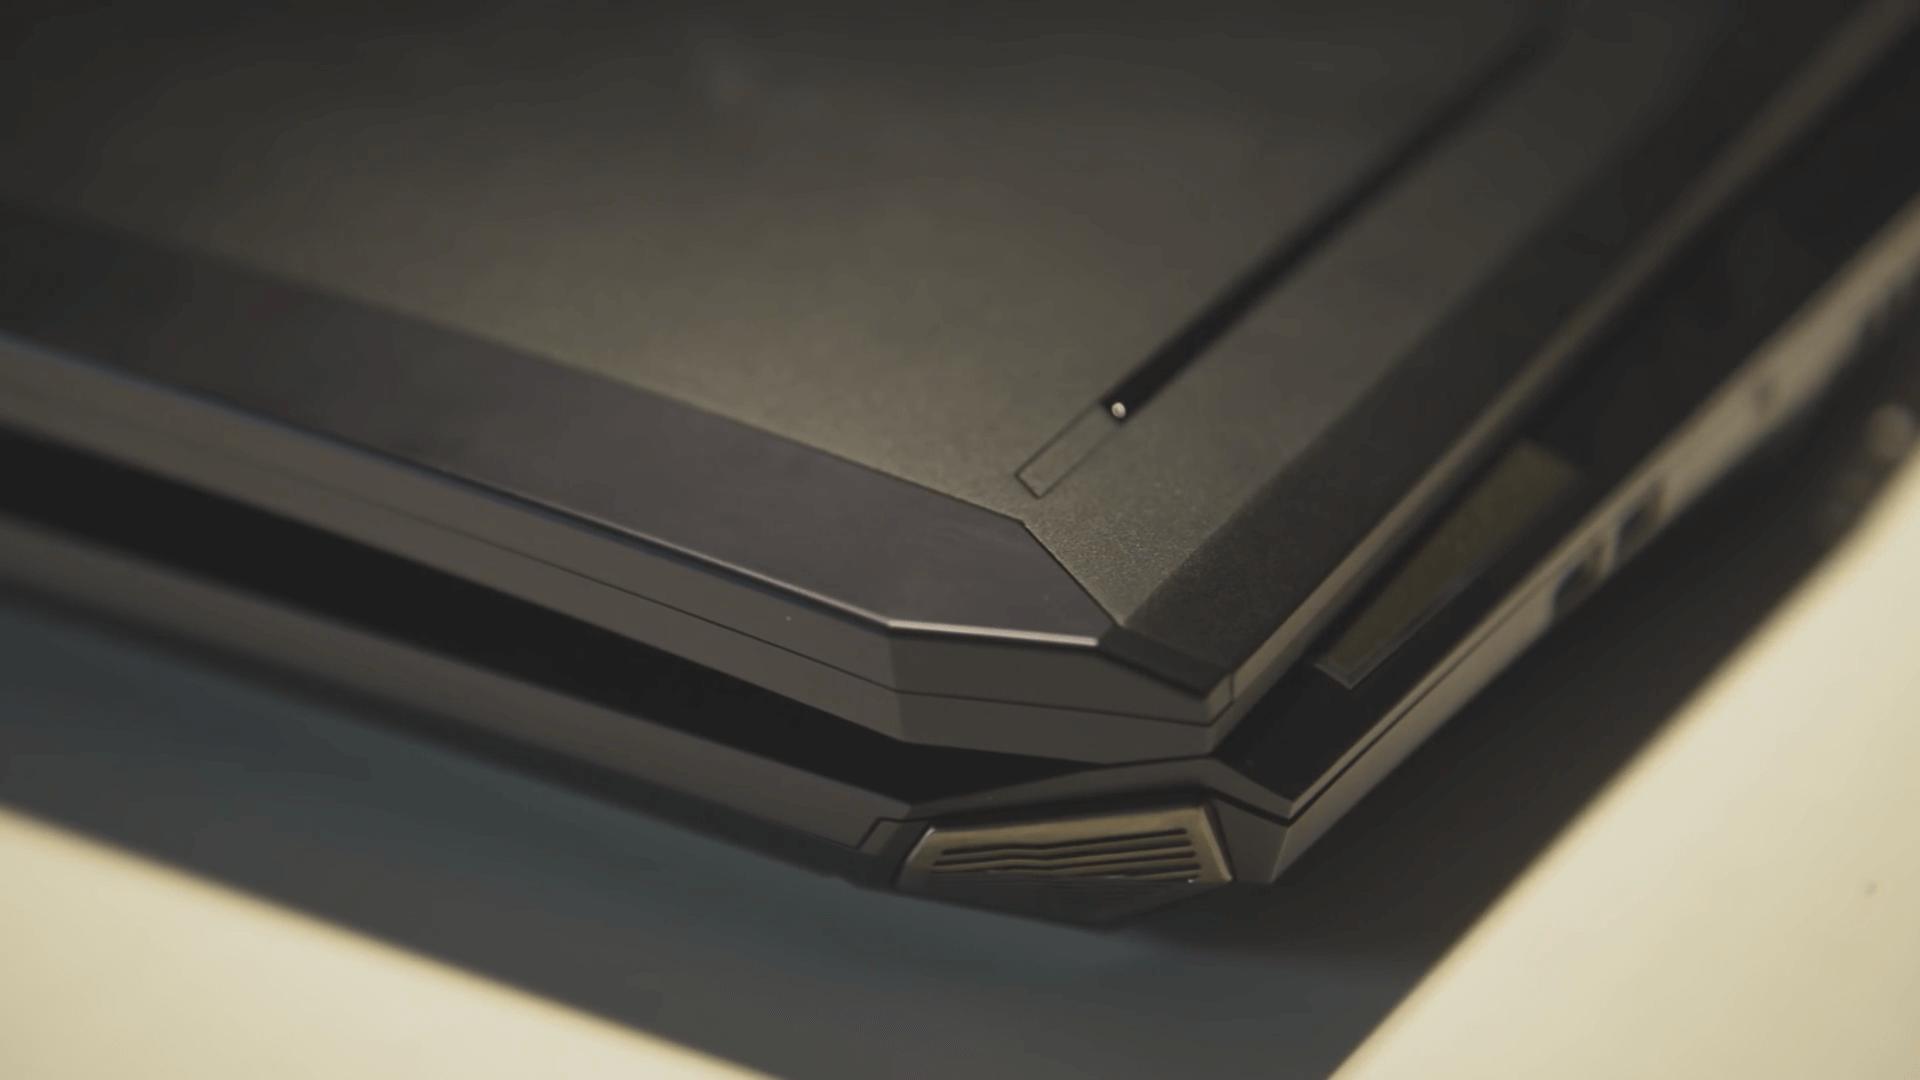 Acer predator 21 x обзор